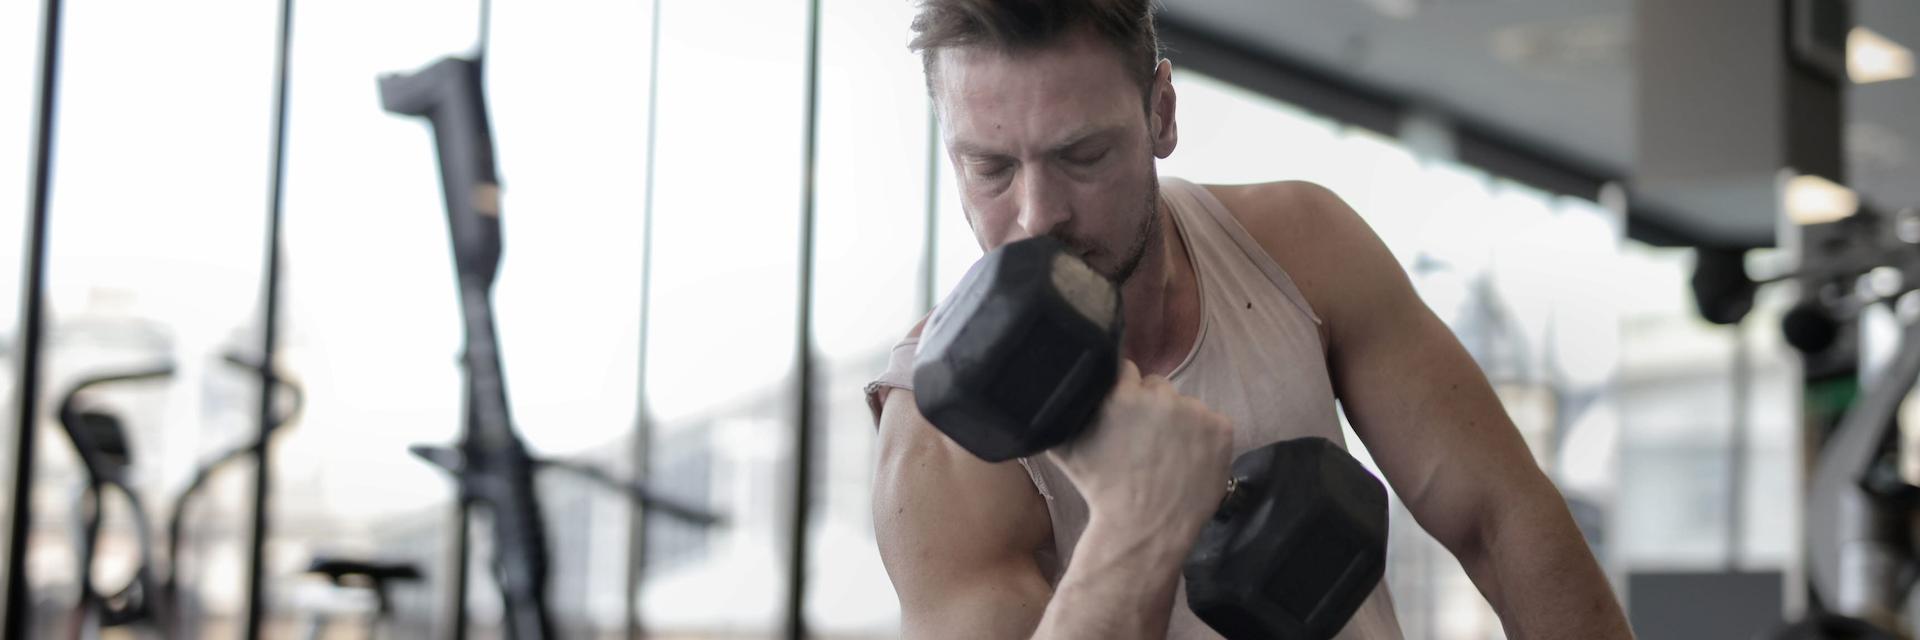 5 Best Exercises To Get Bigger Biceps